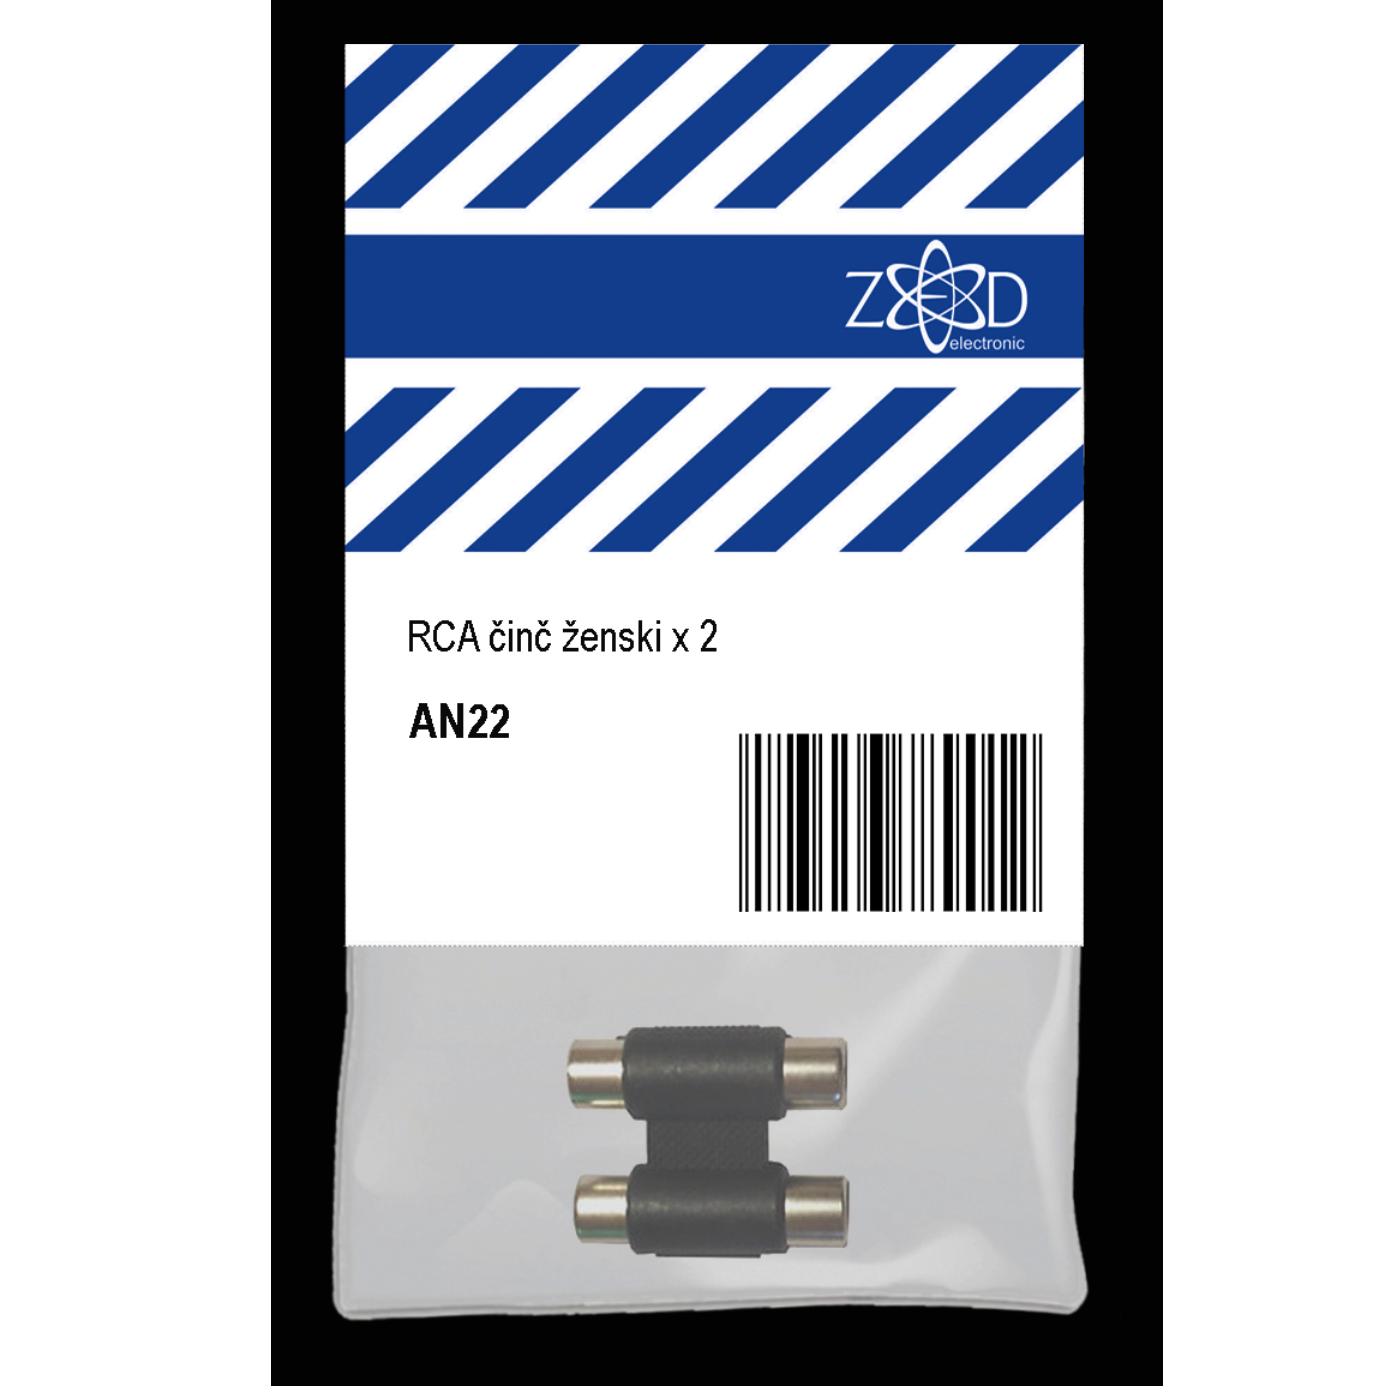 ZED electronic - AN22